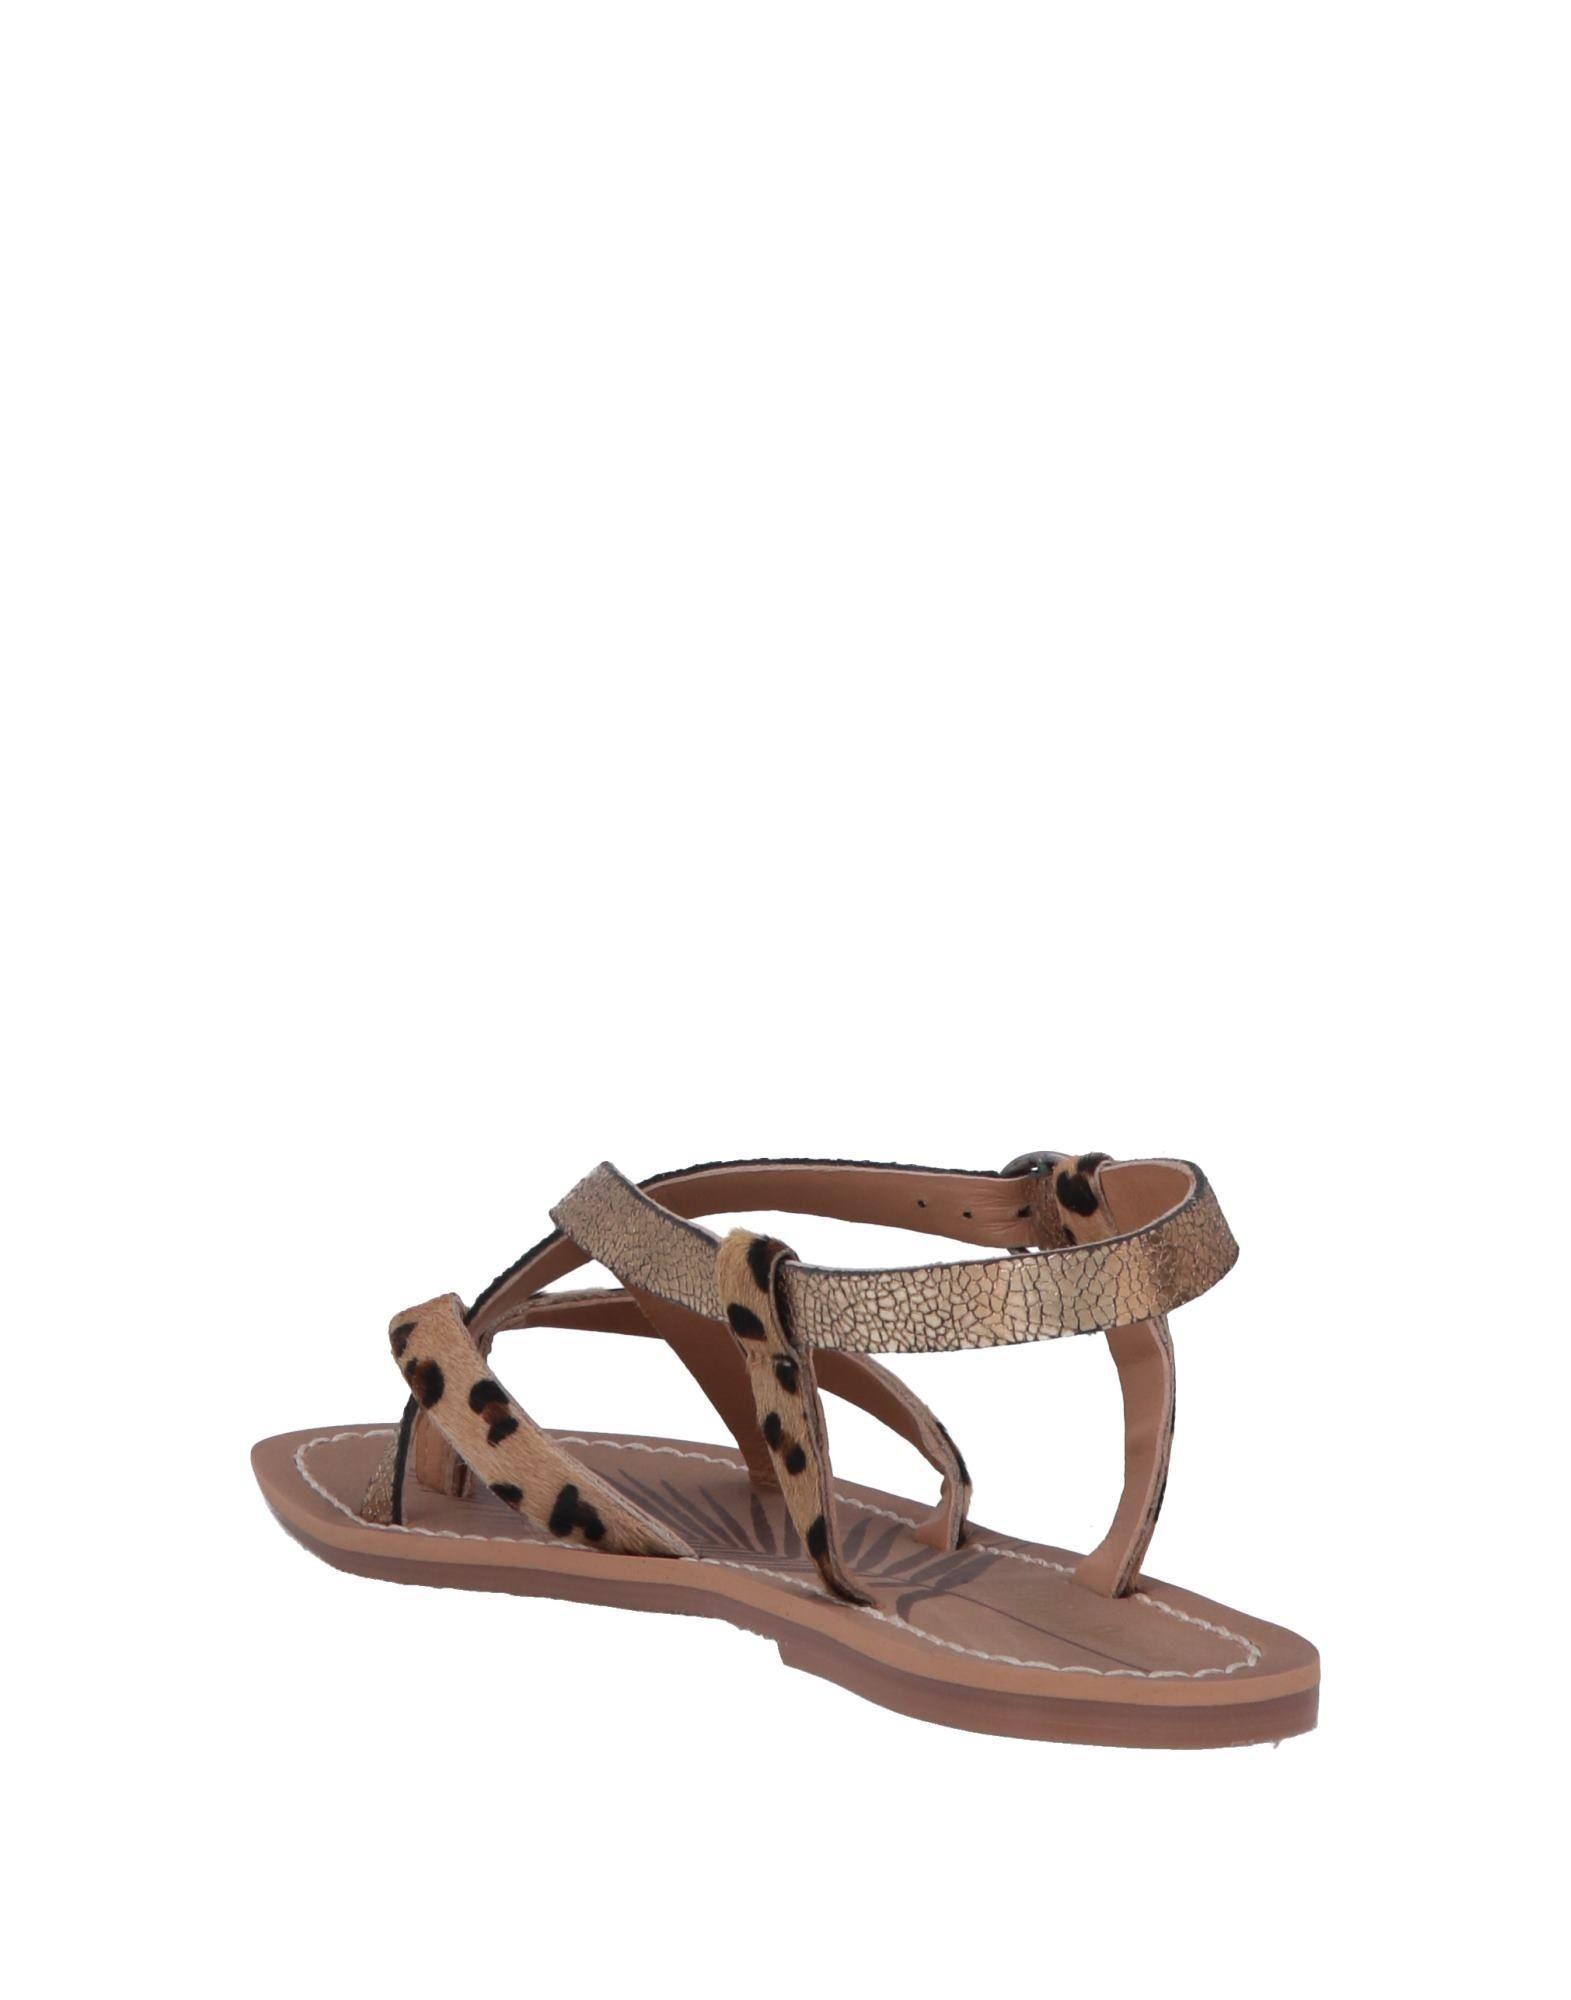 2830a0caea924e Pepe Jeans Toe Post Sandal in Metallic - Lyst